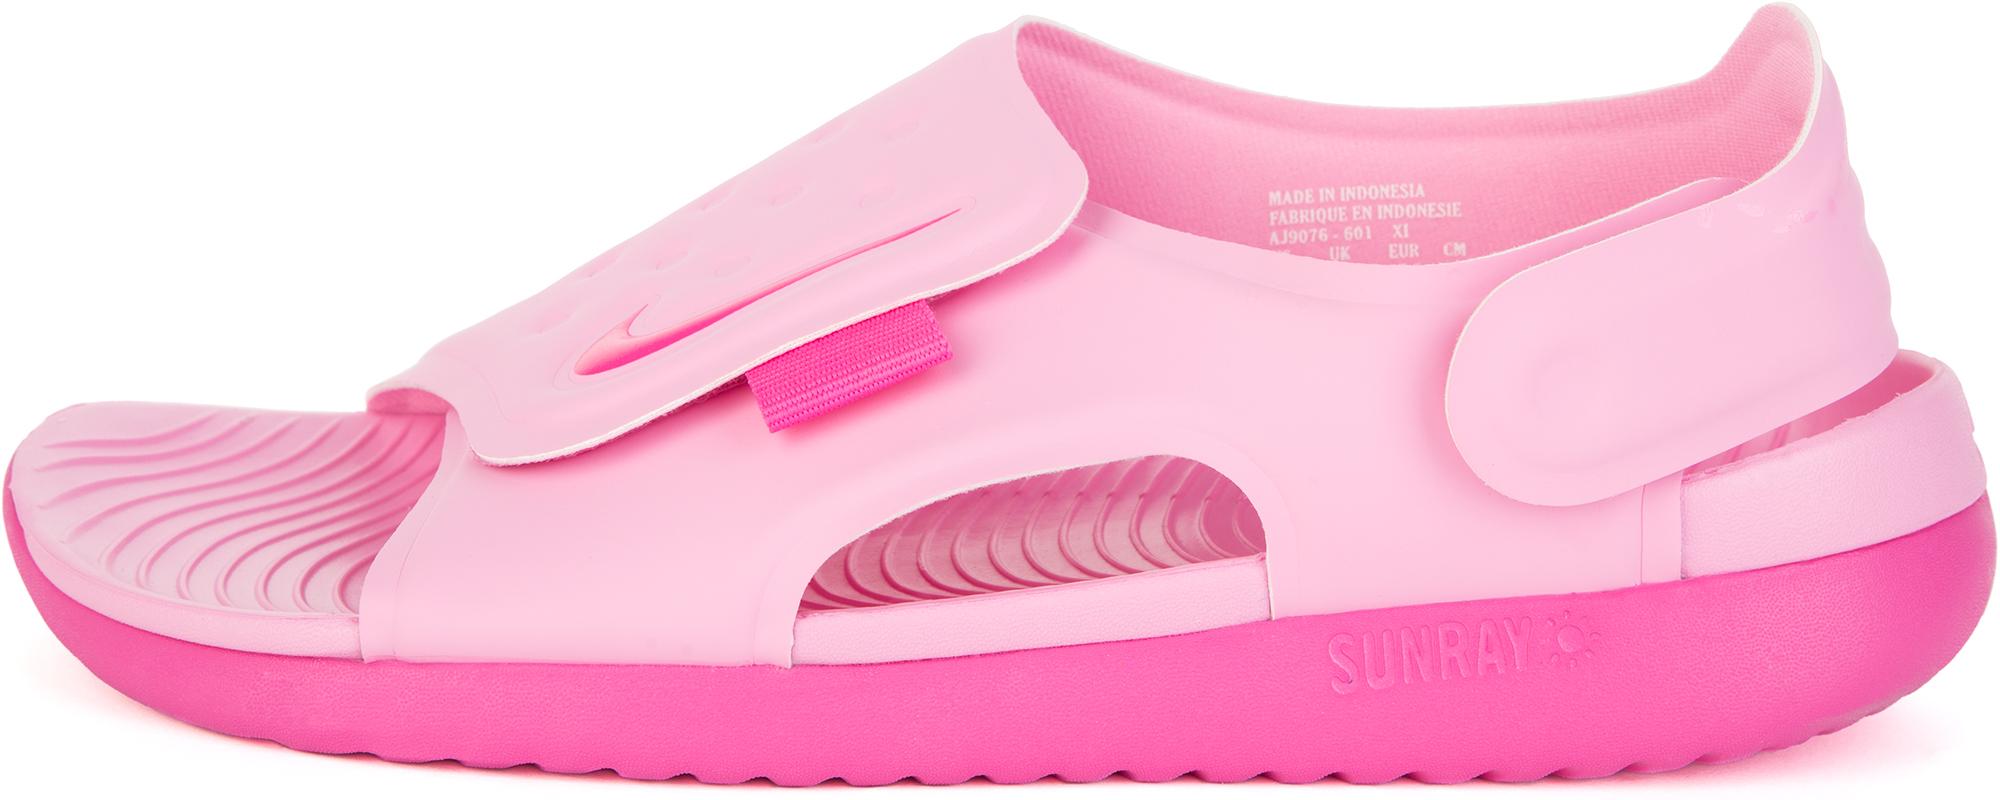 Nike Сандалии для девочек Nike Sunray Adjust 5, размер 36.5